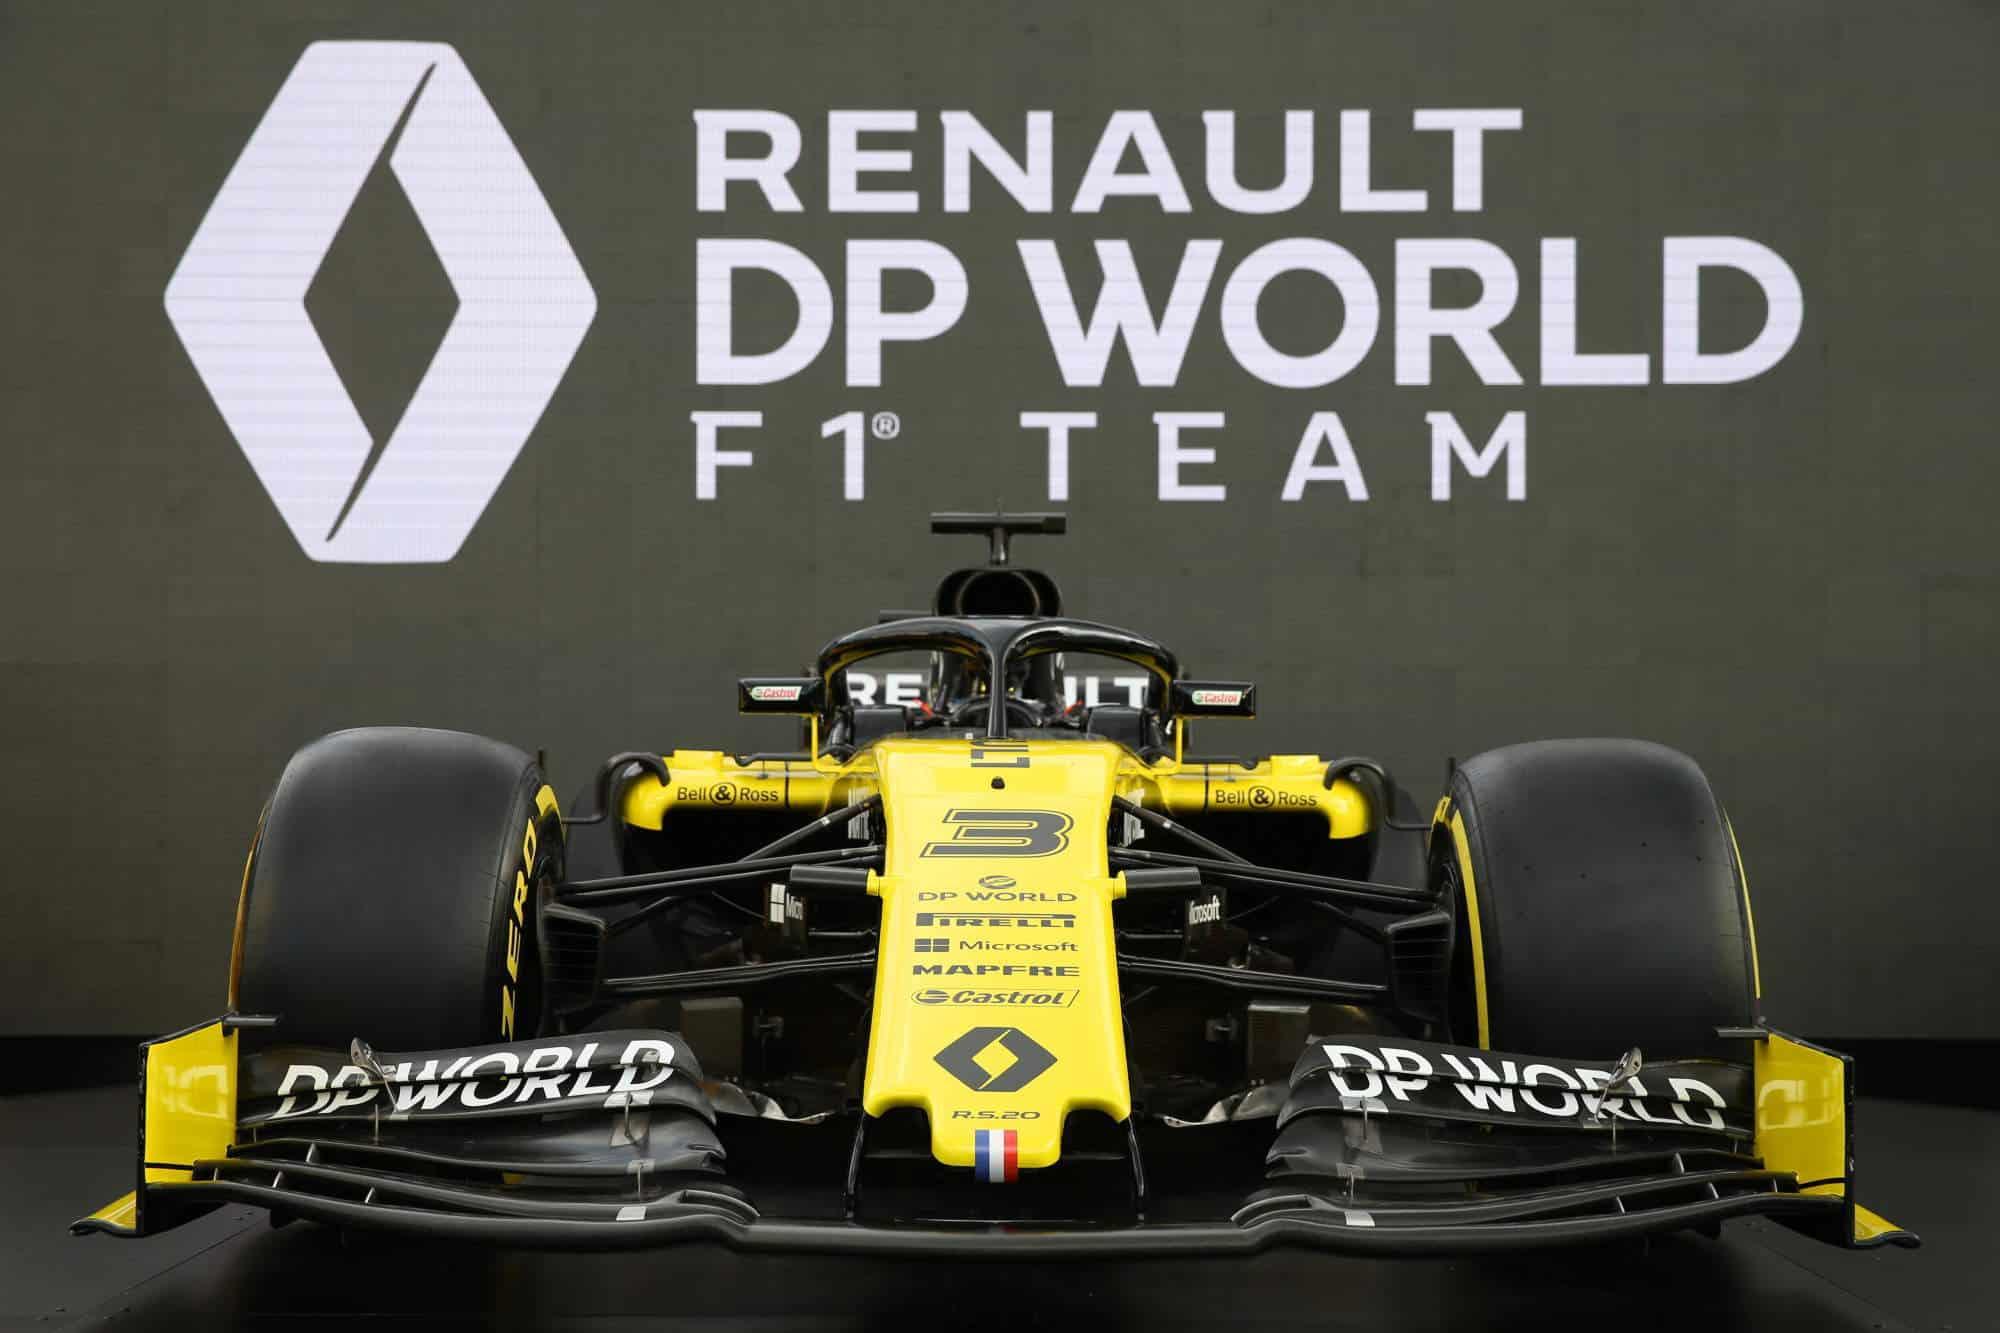 Renault F1 2020 livery Photo Renault